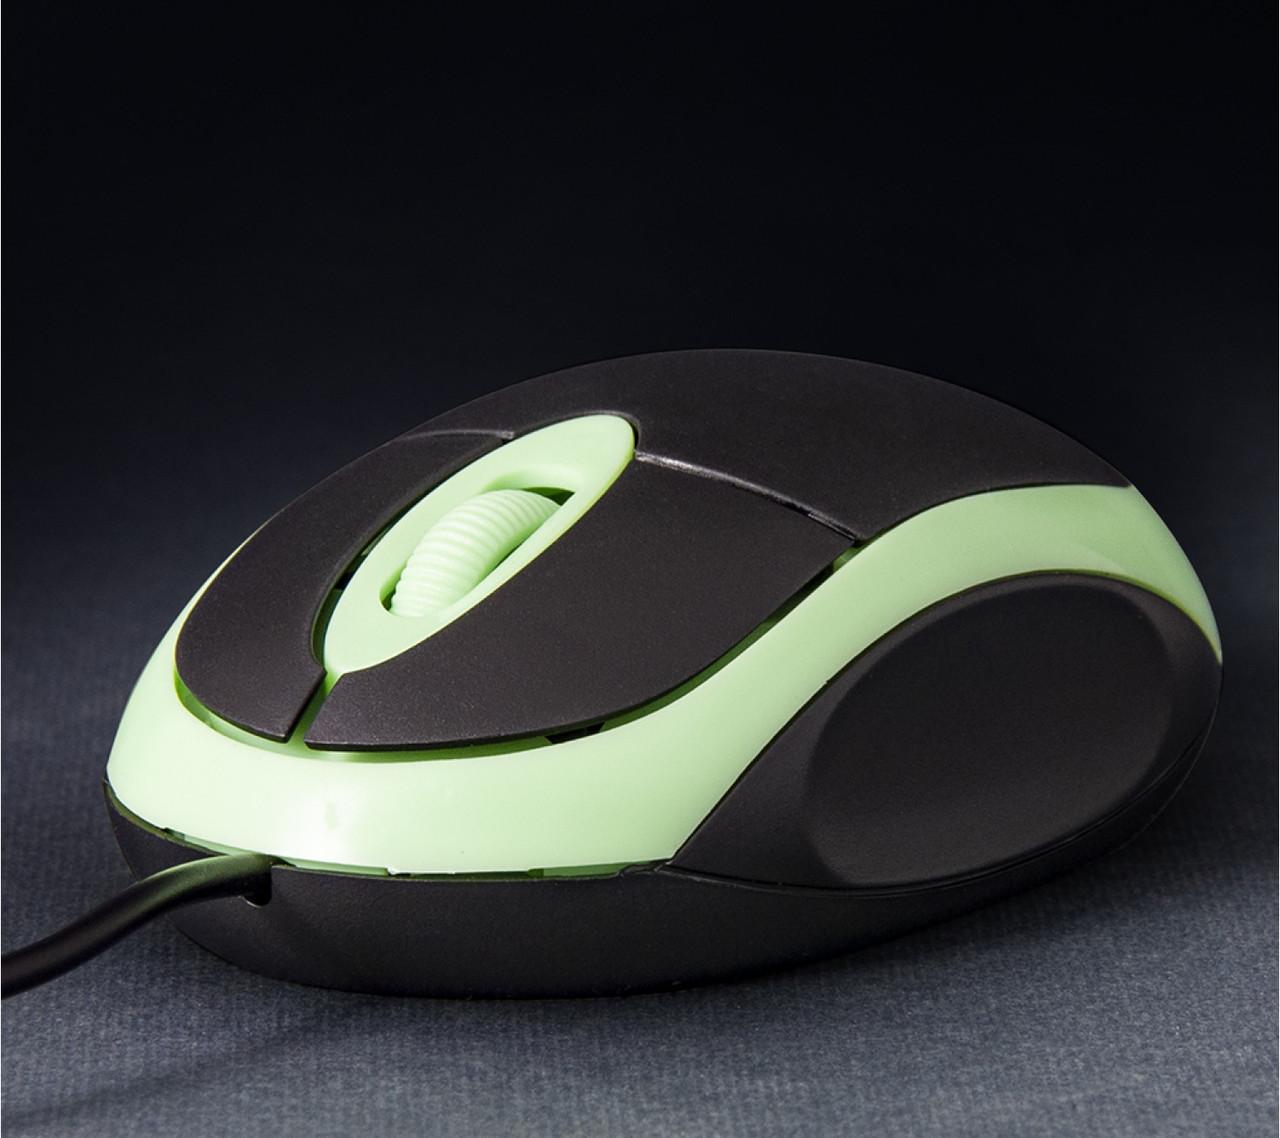 Мышь проводная Frime FM-001 Black/Green USB